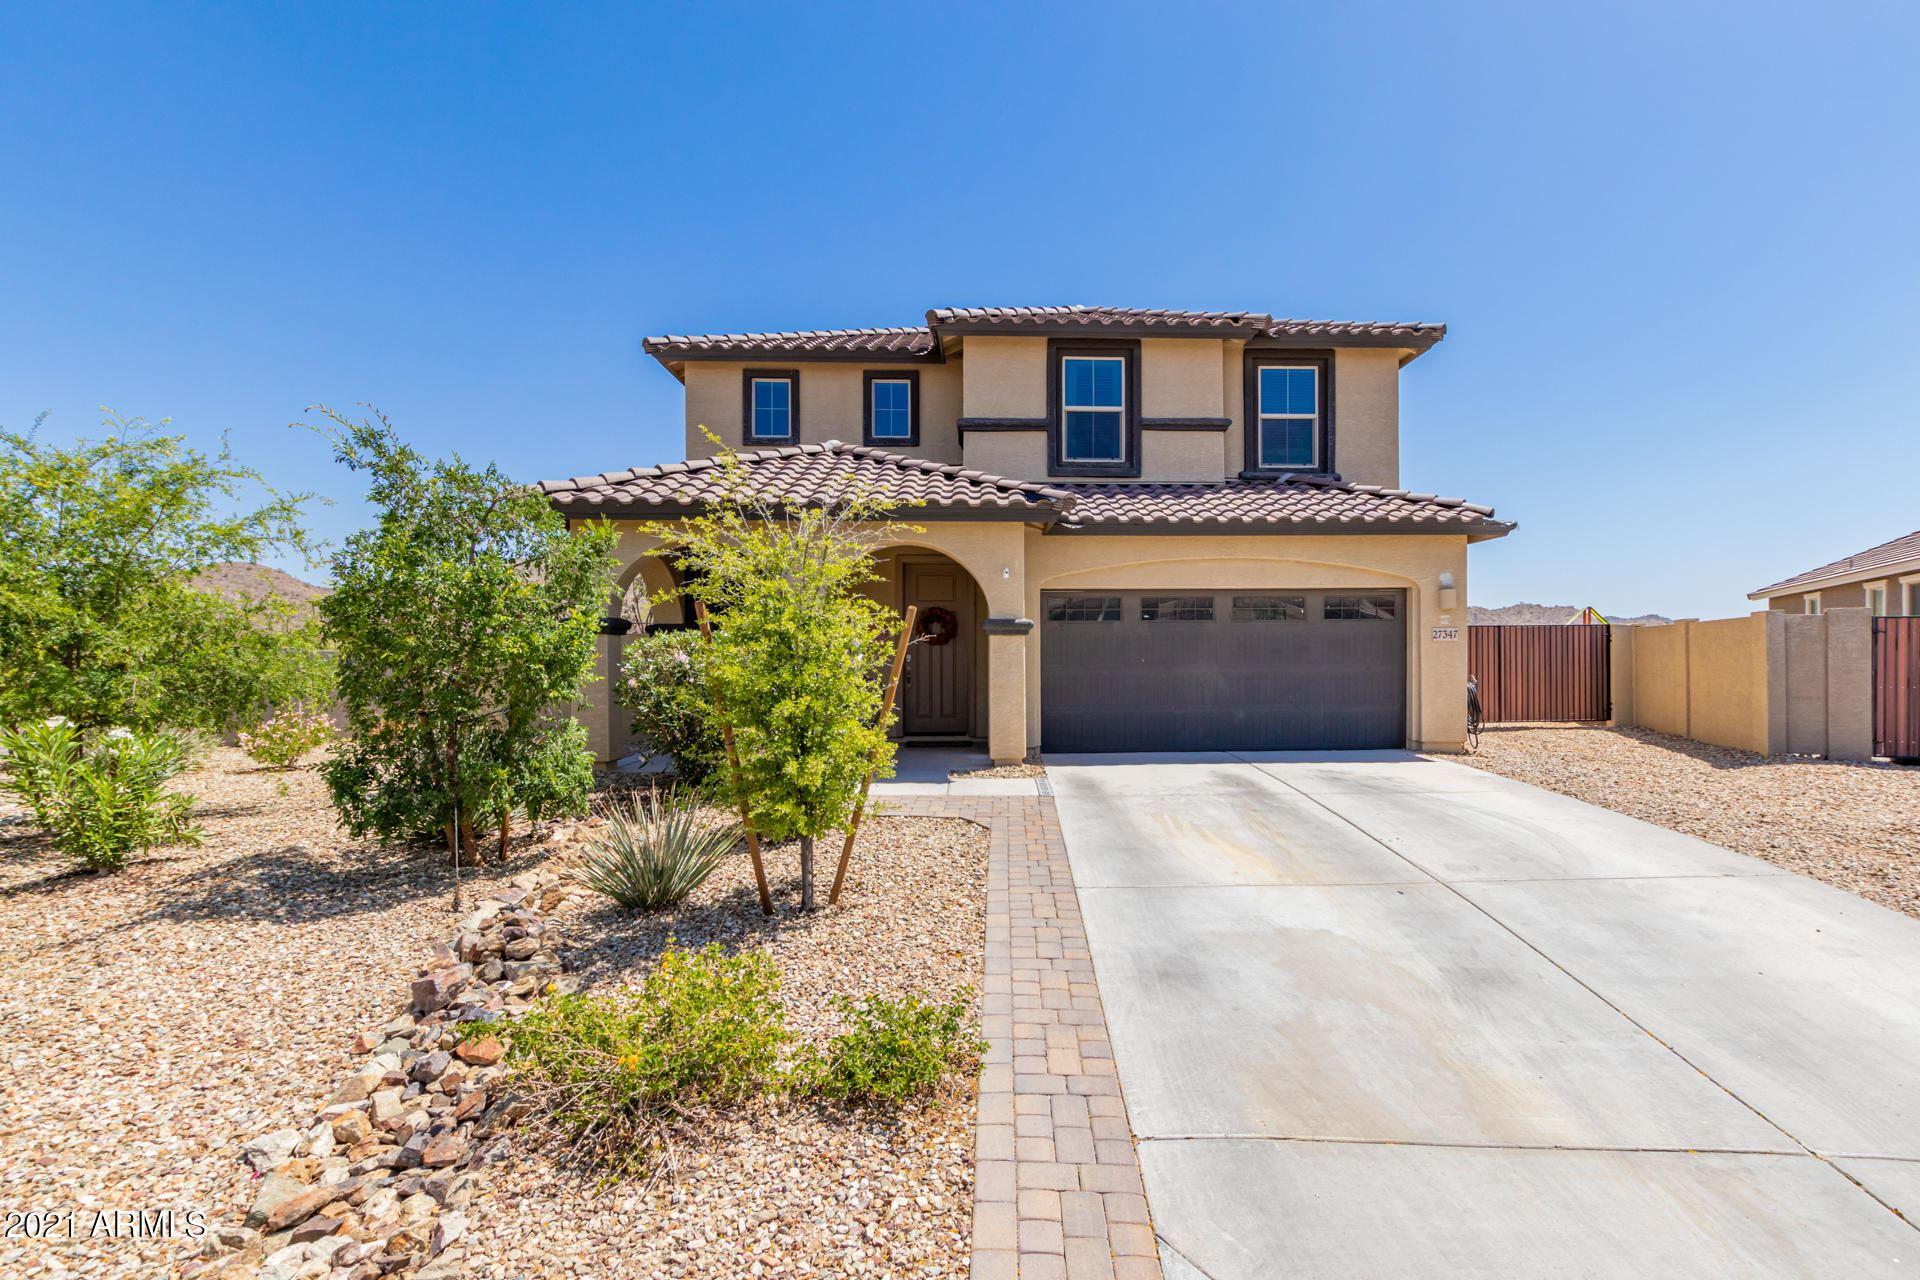 27347 N 75TH Drive, Peoria, AZ 85383 - #: 6225535